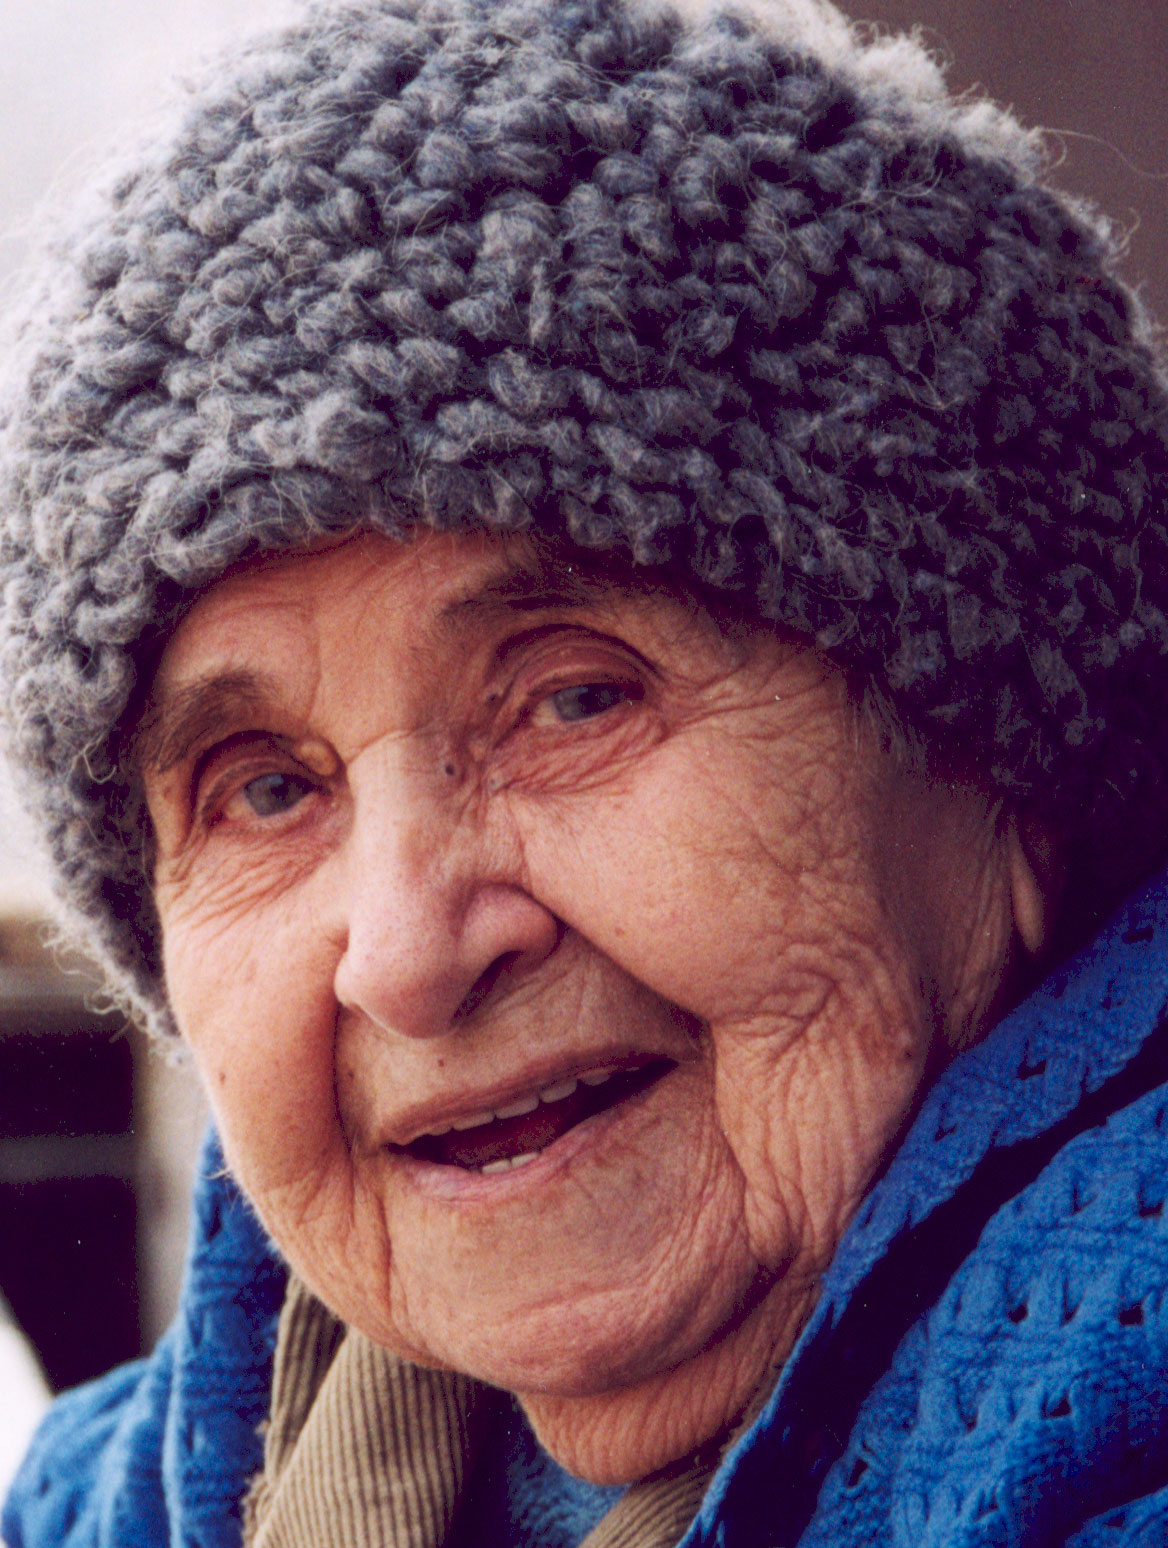 http://1.bp.blogspot.com/-4ijDnS9uJ48/TdY2AfOLMeI/AAAAAAAAAQI/mR9sApEQXRk/s1600/Old-woman.jpg